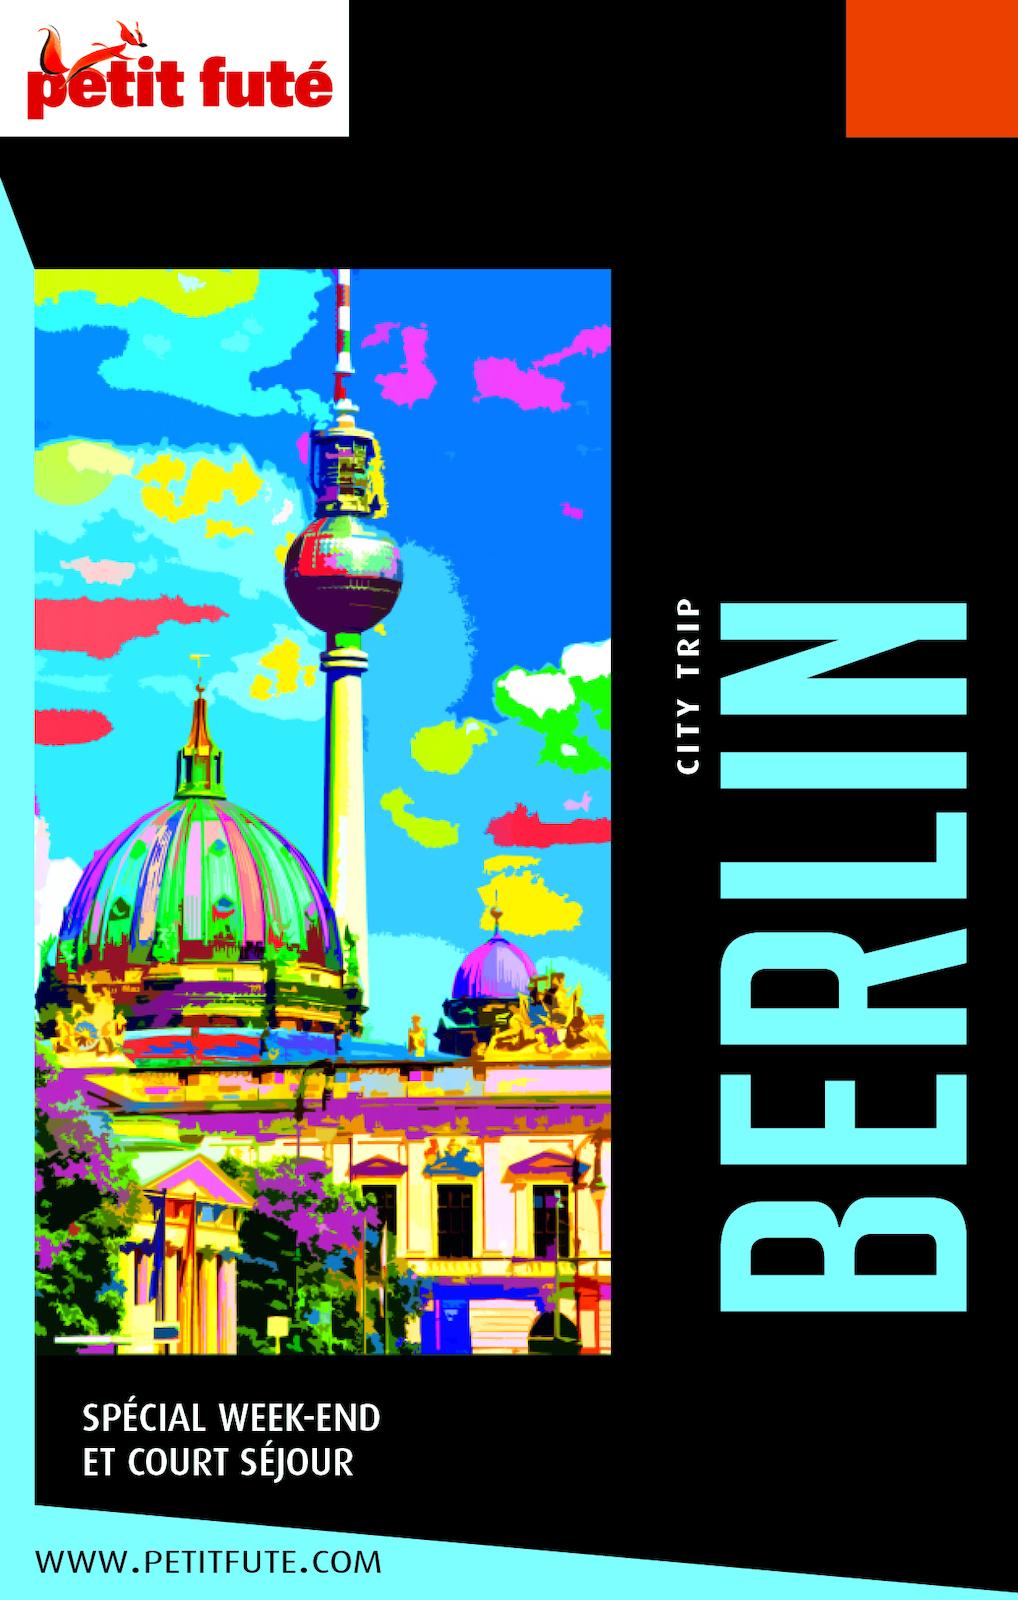 BERLIN - CITY TRIP 2019/2020 City trip Petit Futé